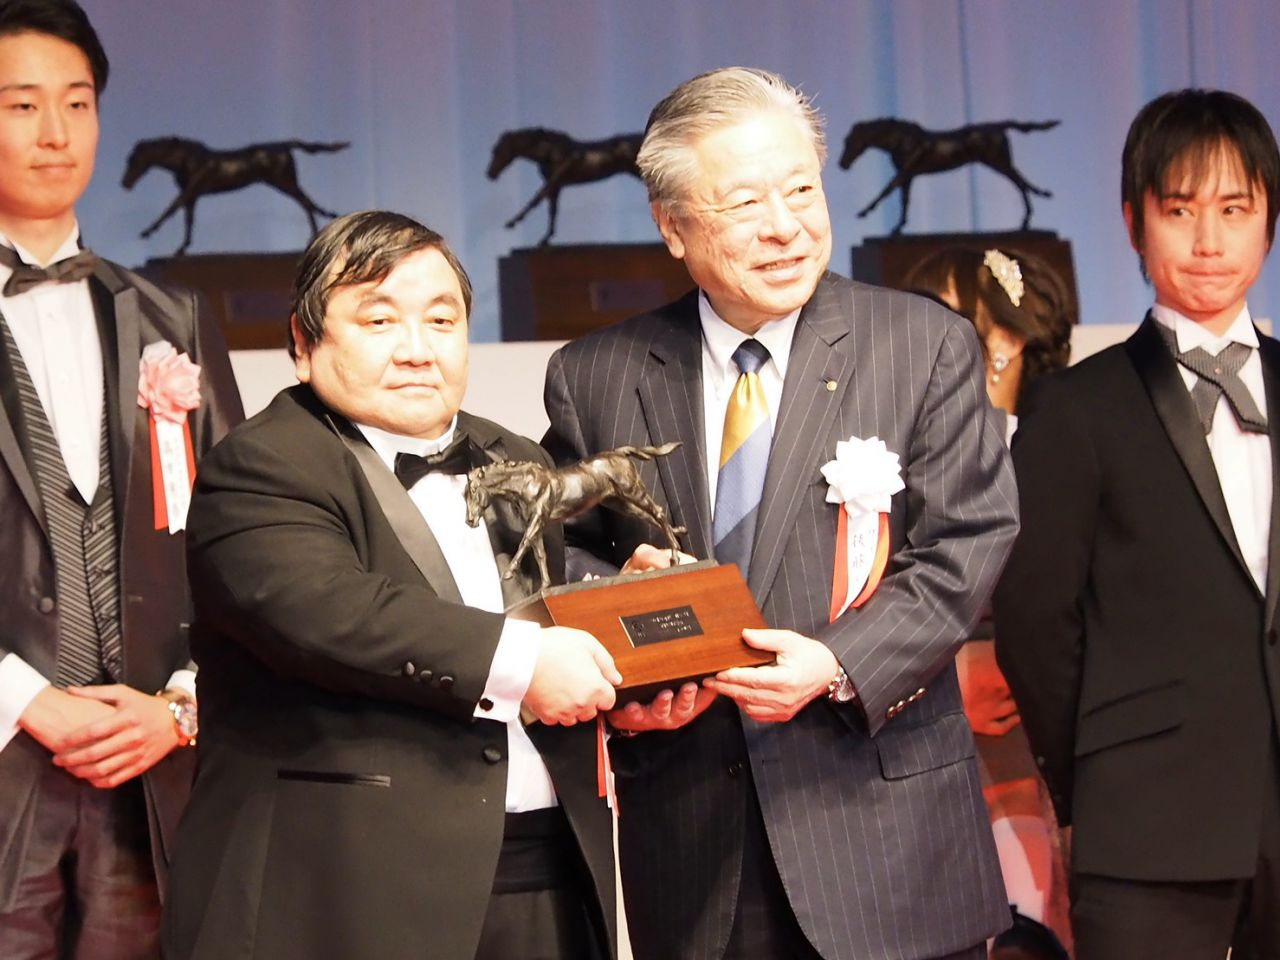 【JRA賞】安田隆師「3人揃って呼ばれたことを嬉しく思う」最多勝利調教師